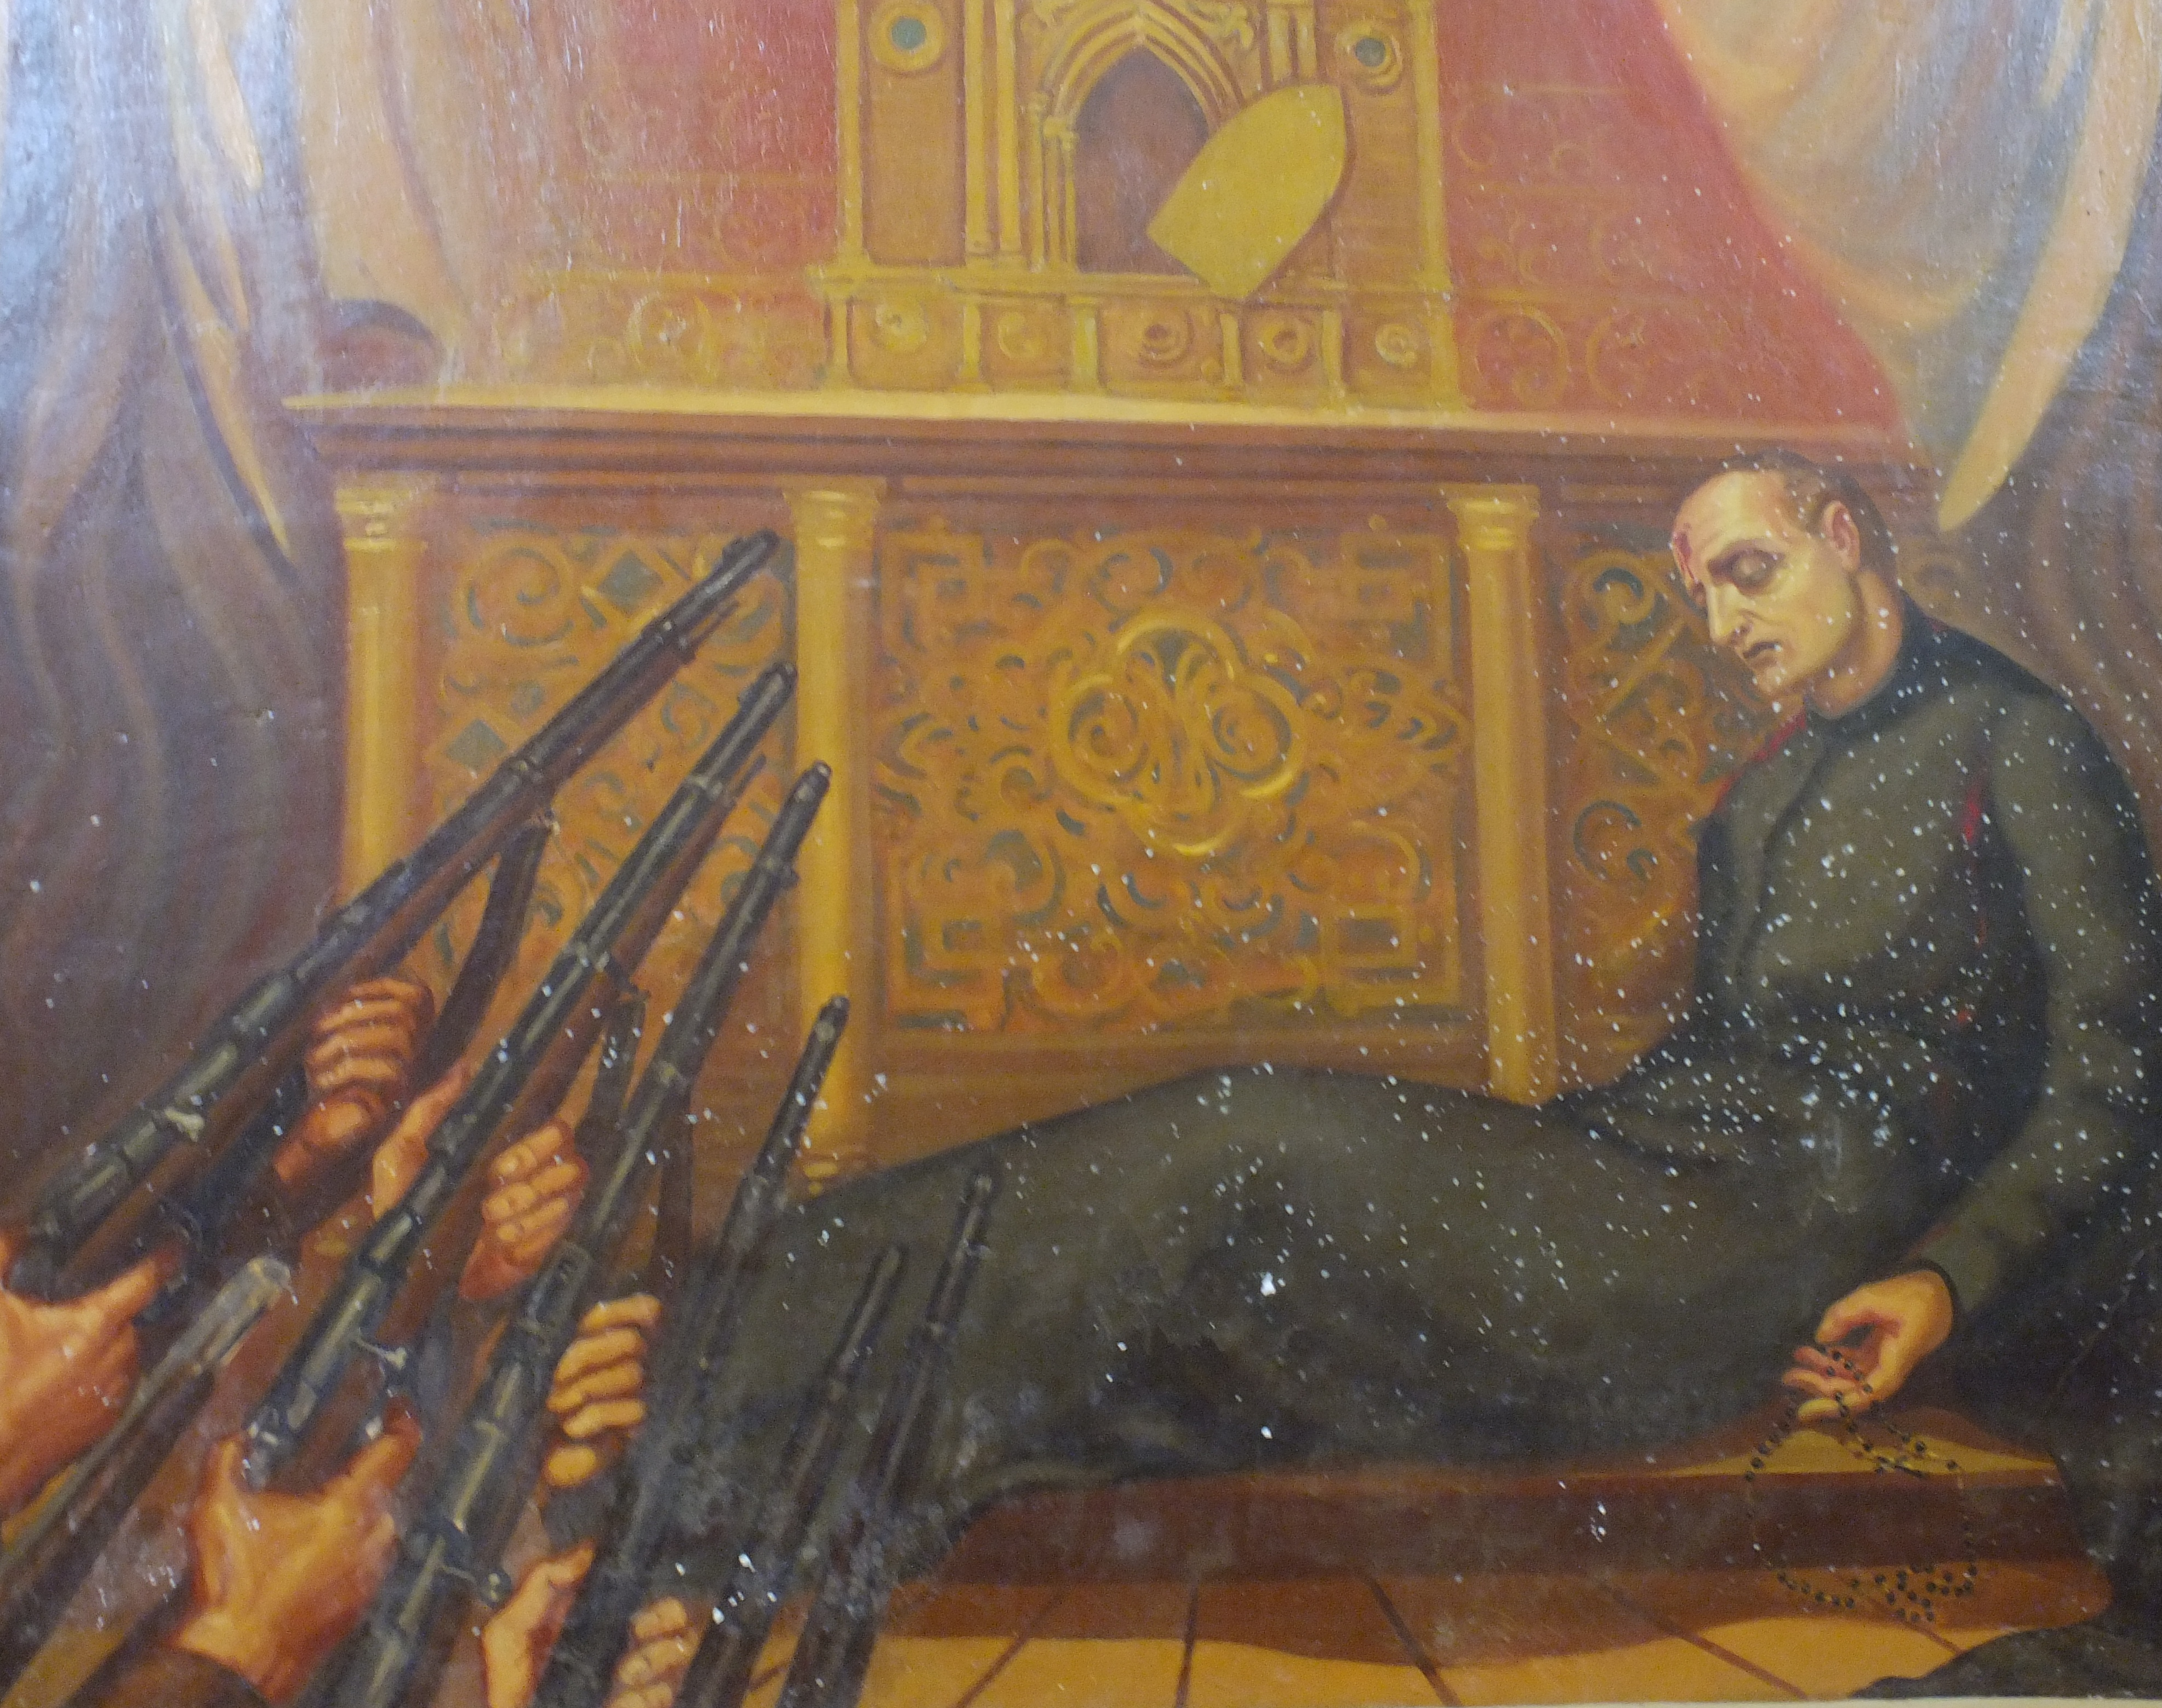 Asesinato del P. Emilio Moscoso. Fresco en el Templo S. Felipe en Riobamba, Ecuador